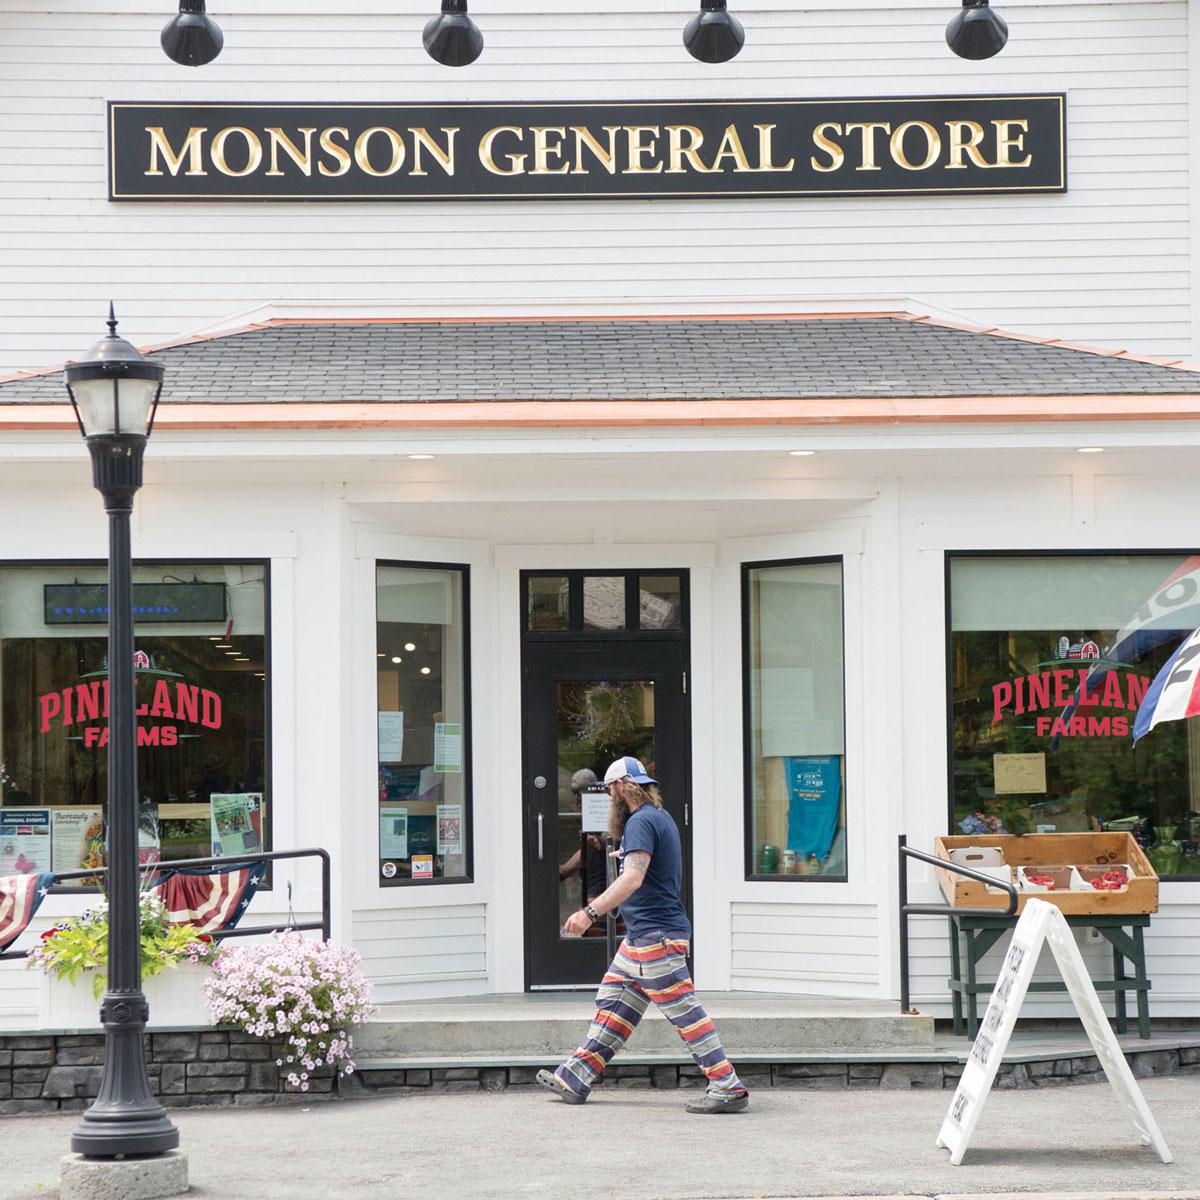 Monson General Store